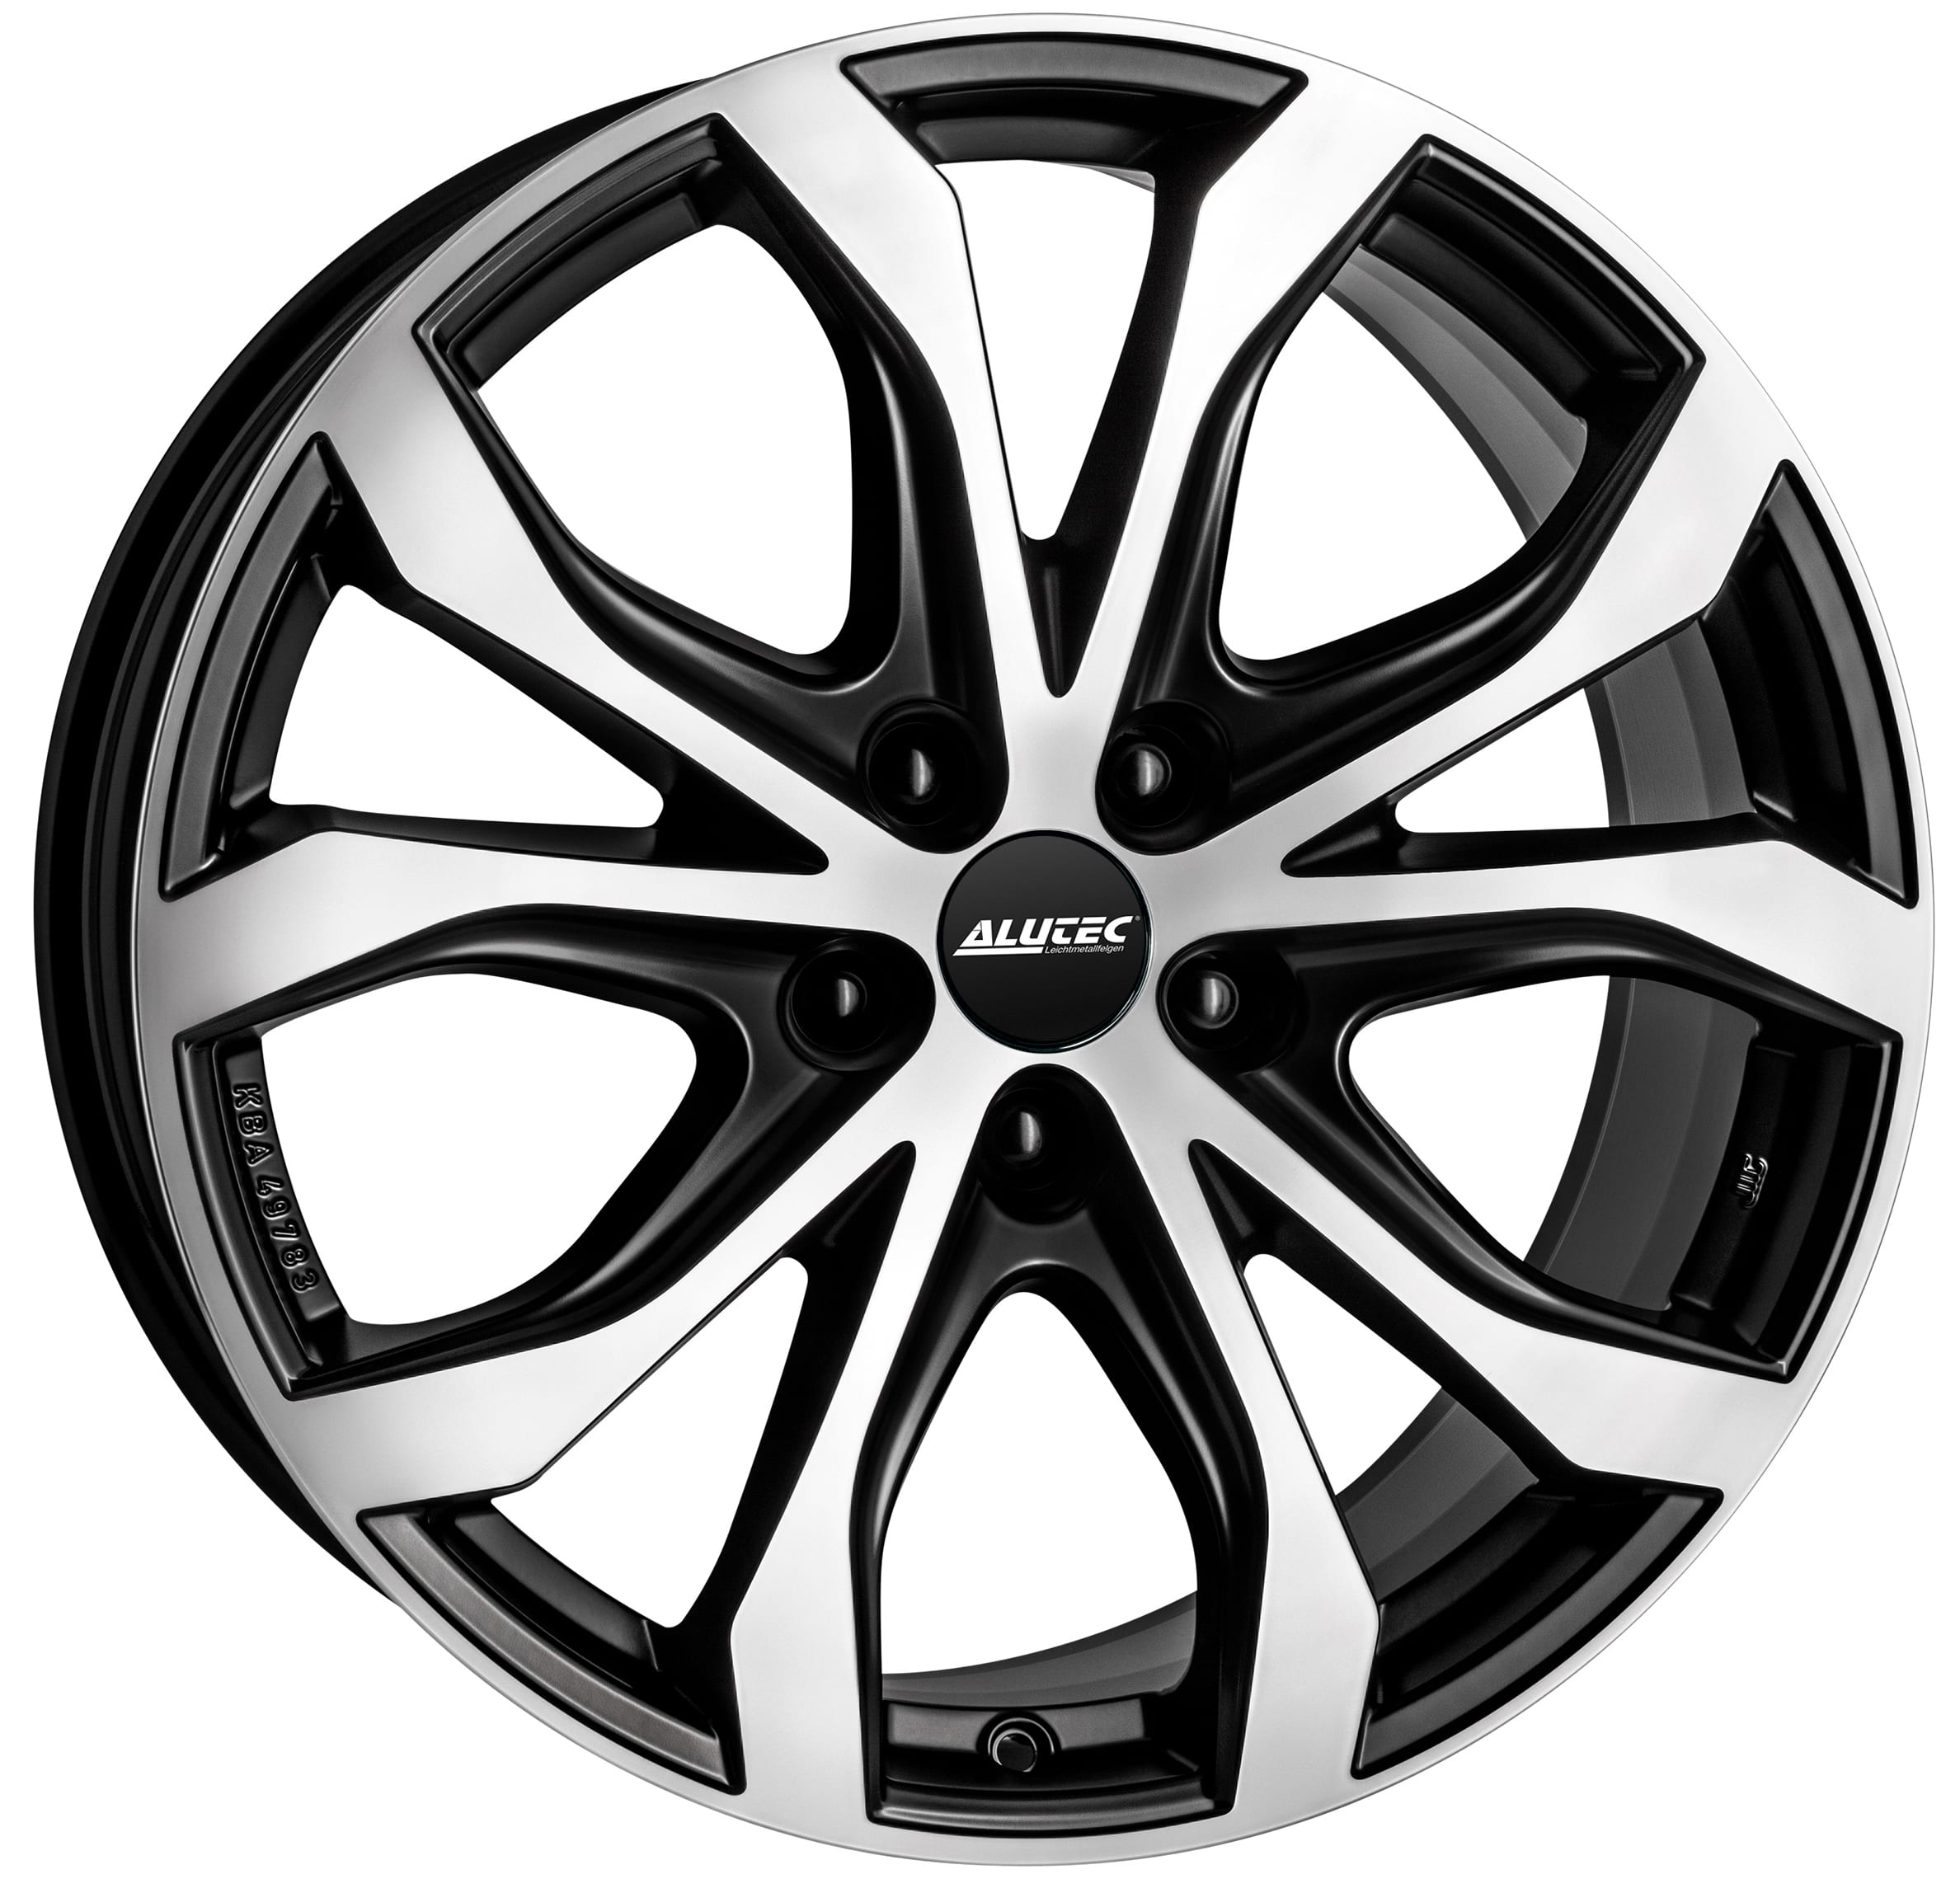 Alutec - W10 (Racing Black / Polished)